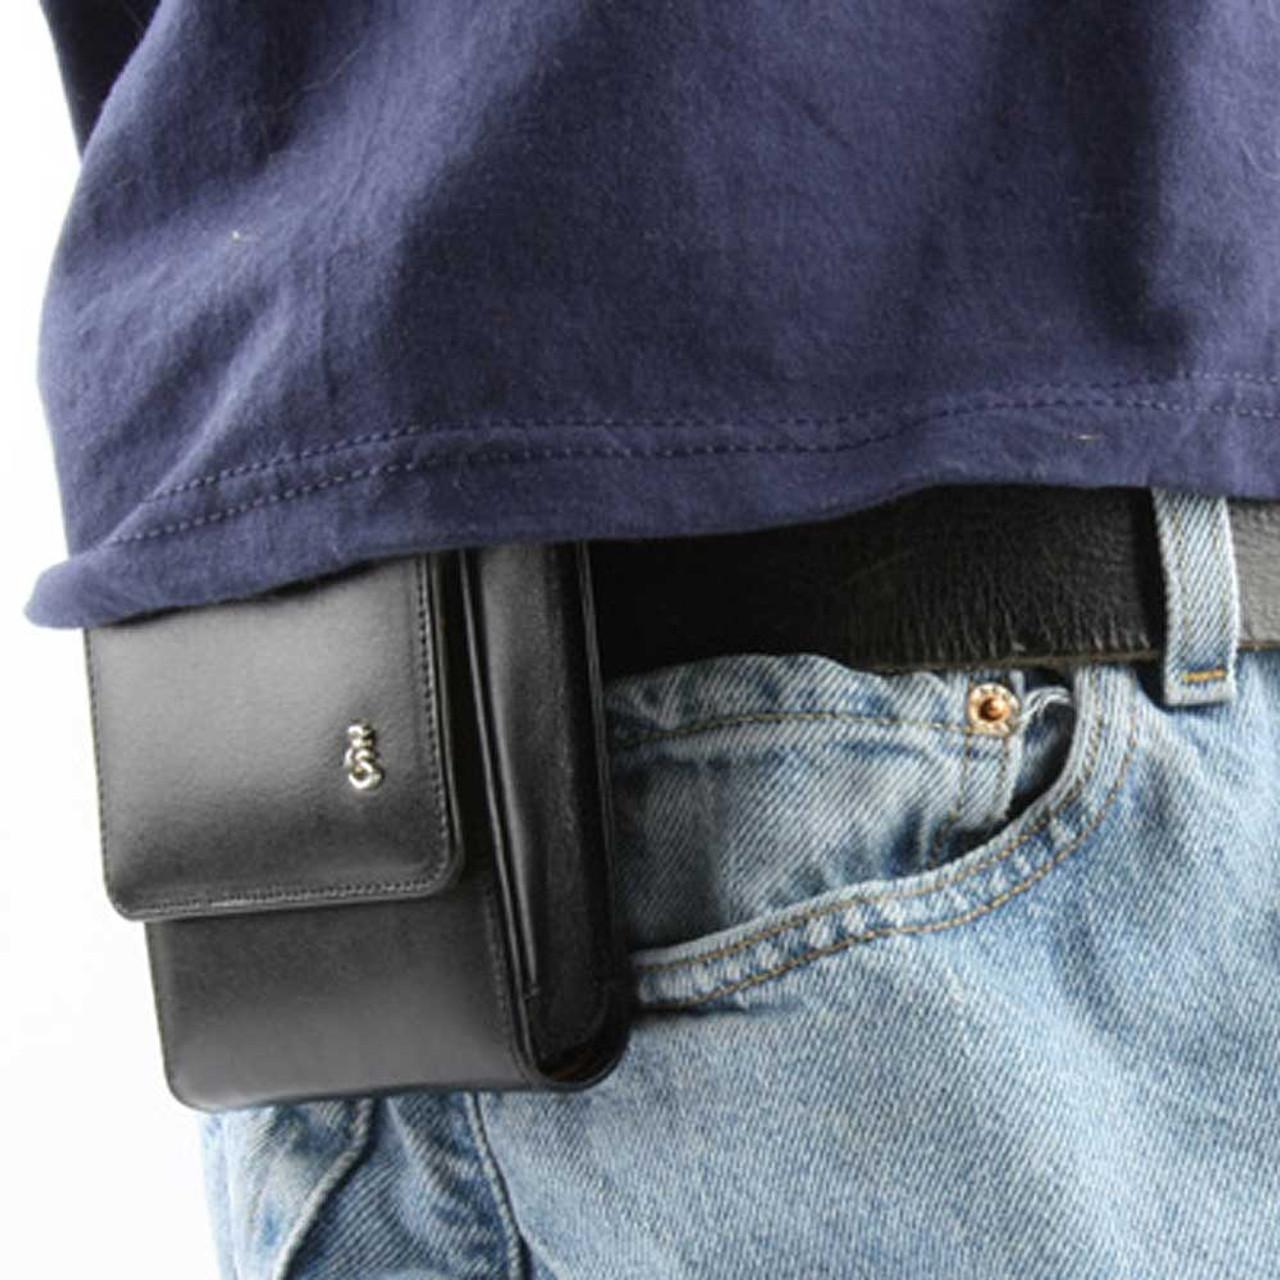 Kahr P380 Concealed Carry Holster (Belt Loop)